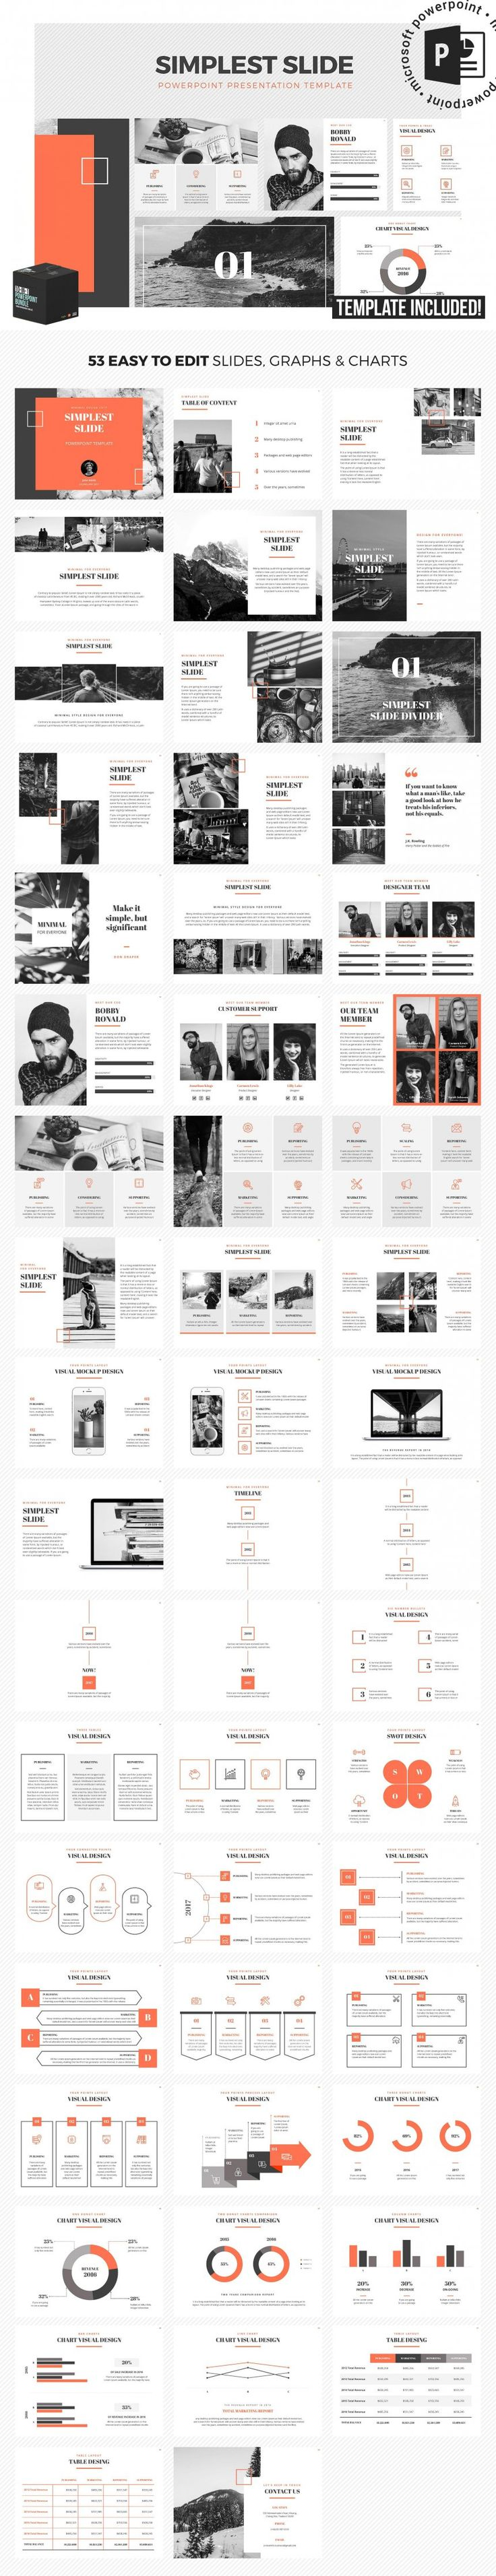 10 Creative And Professional PowerPoint Templates (Plus Bonuses!) | MyDesignDeals